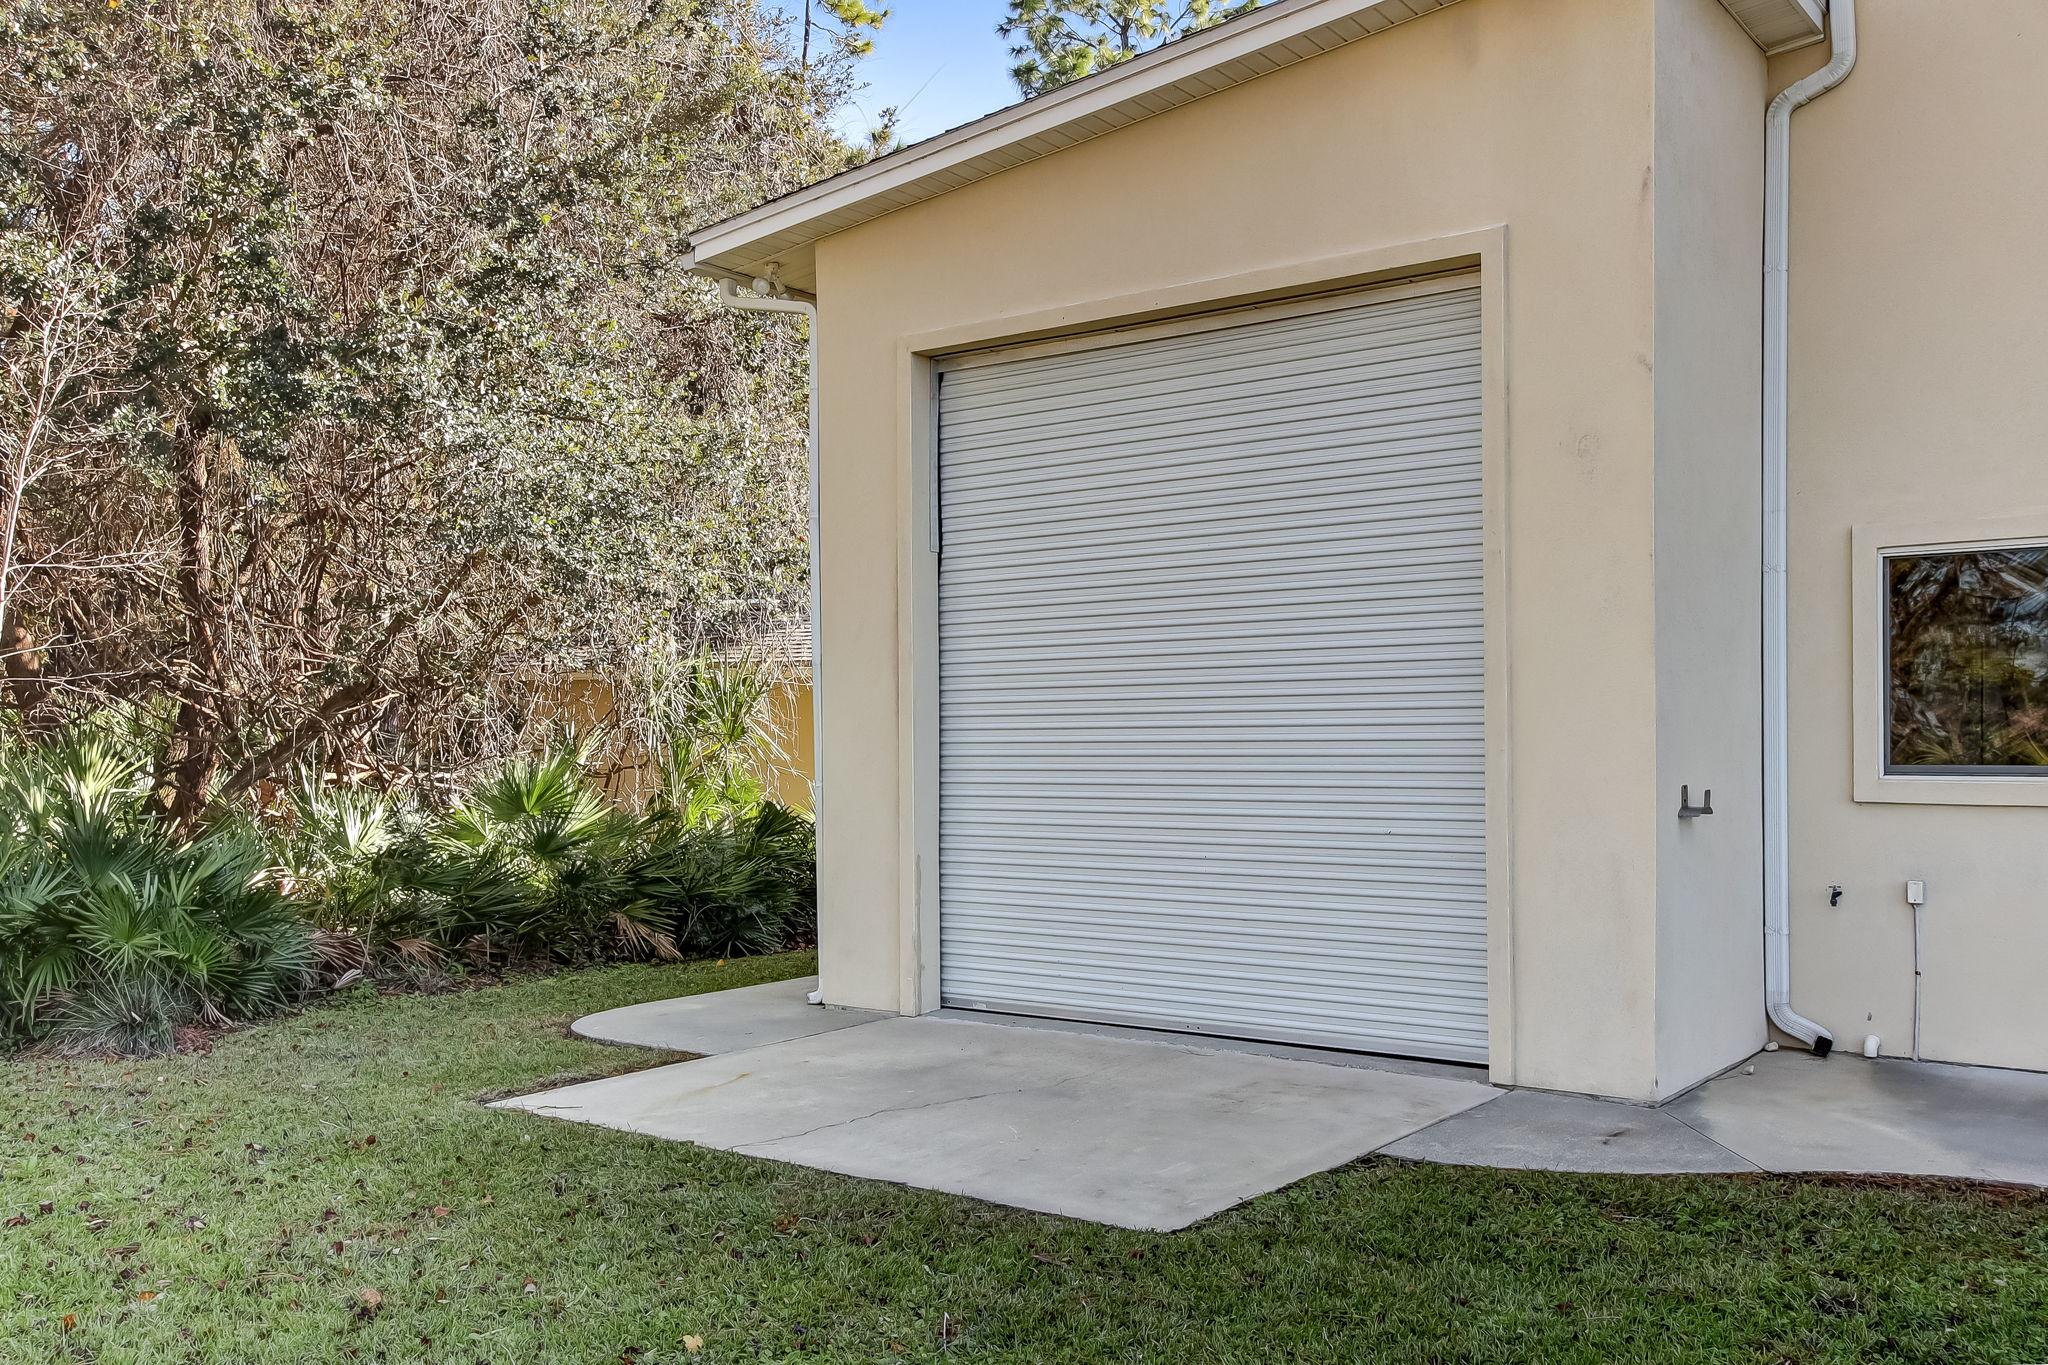 RV/Boat storage back door